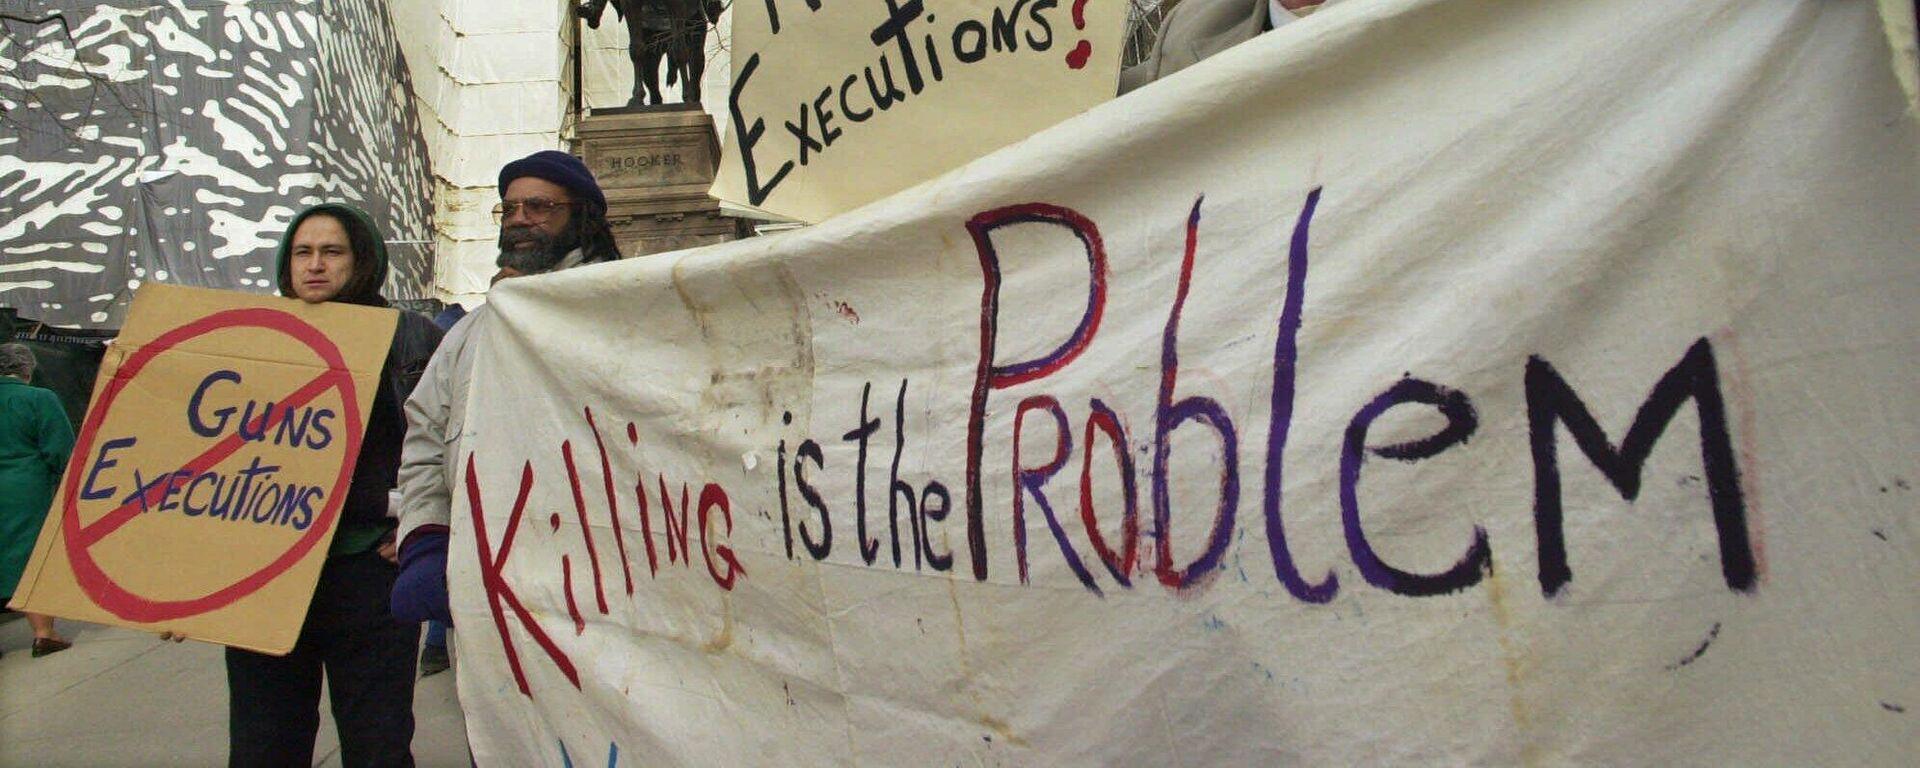 Killing is the Problem - Proteste gegen die Todesstrafe in den USA (Symbolbild) - SNA, 1920, 01.06.2021